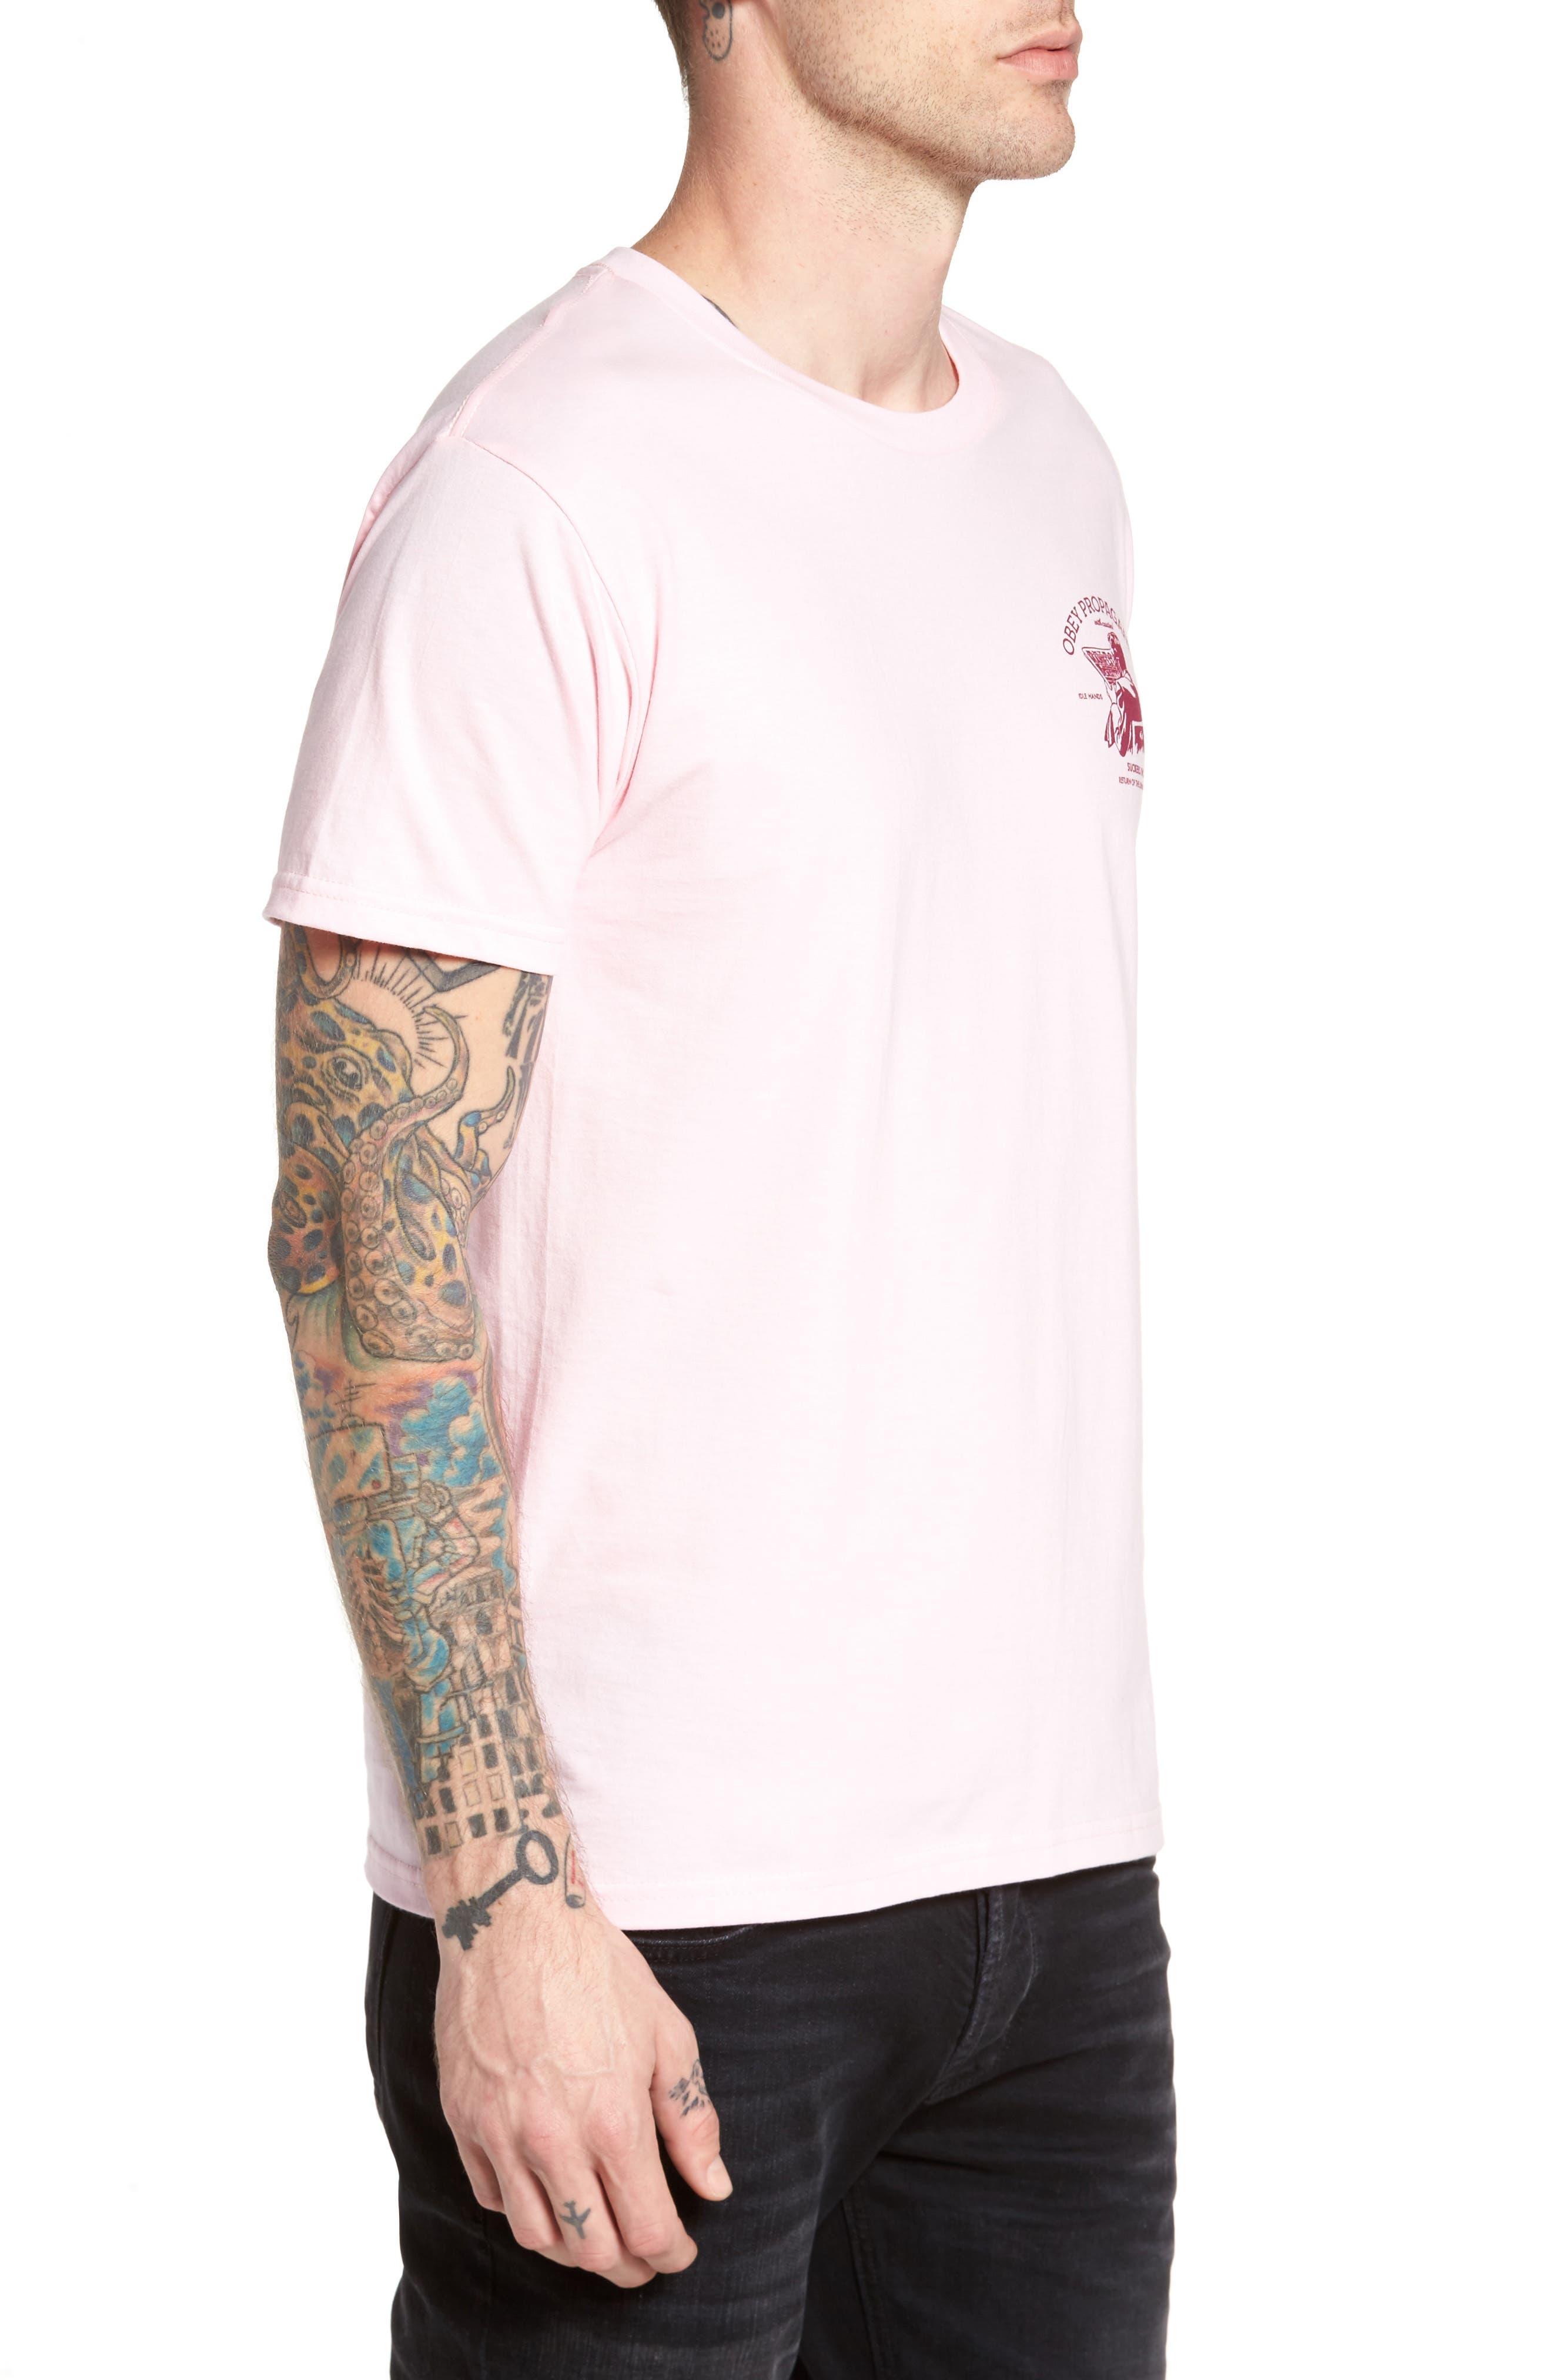 Return of the Dead Premium Graphic T-Shirt,                             Alternate thumbnail 3, color,                             650